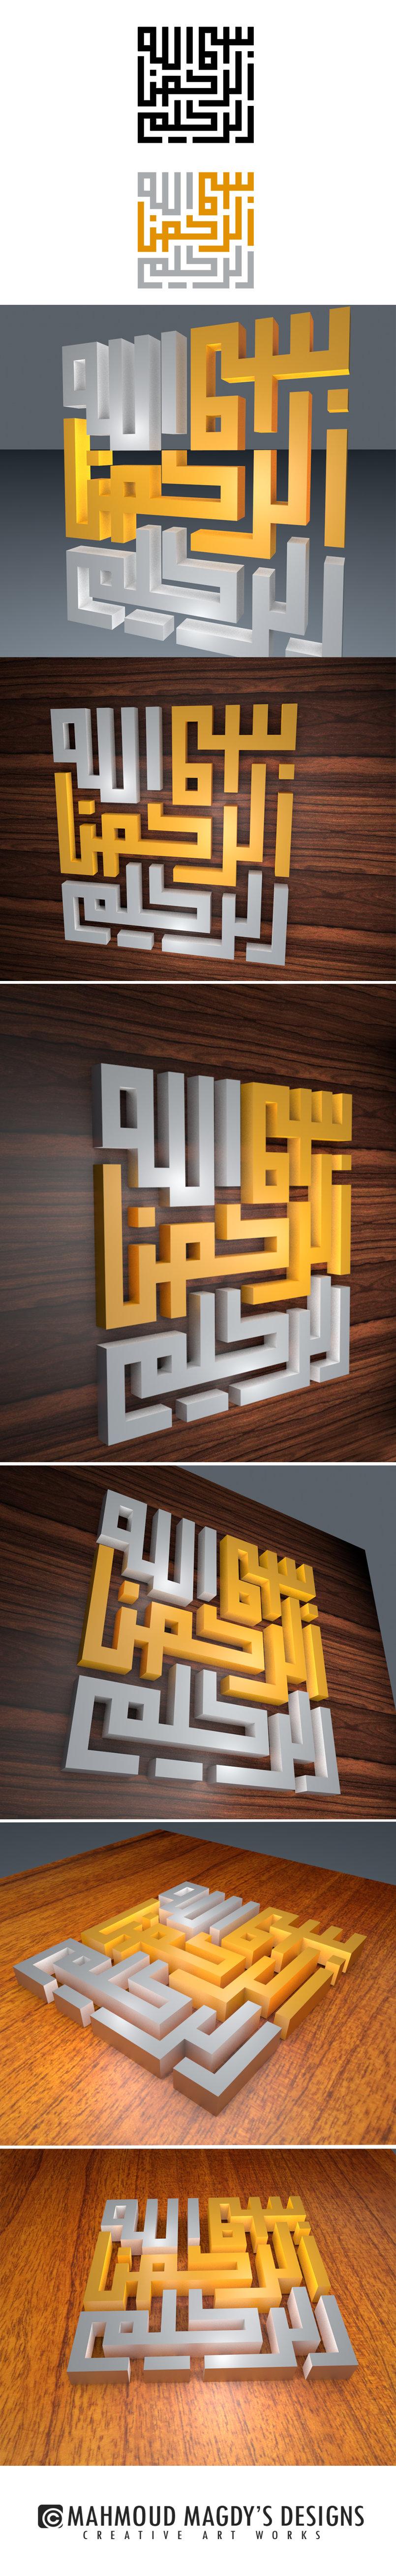 Islamic 3D Work